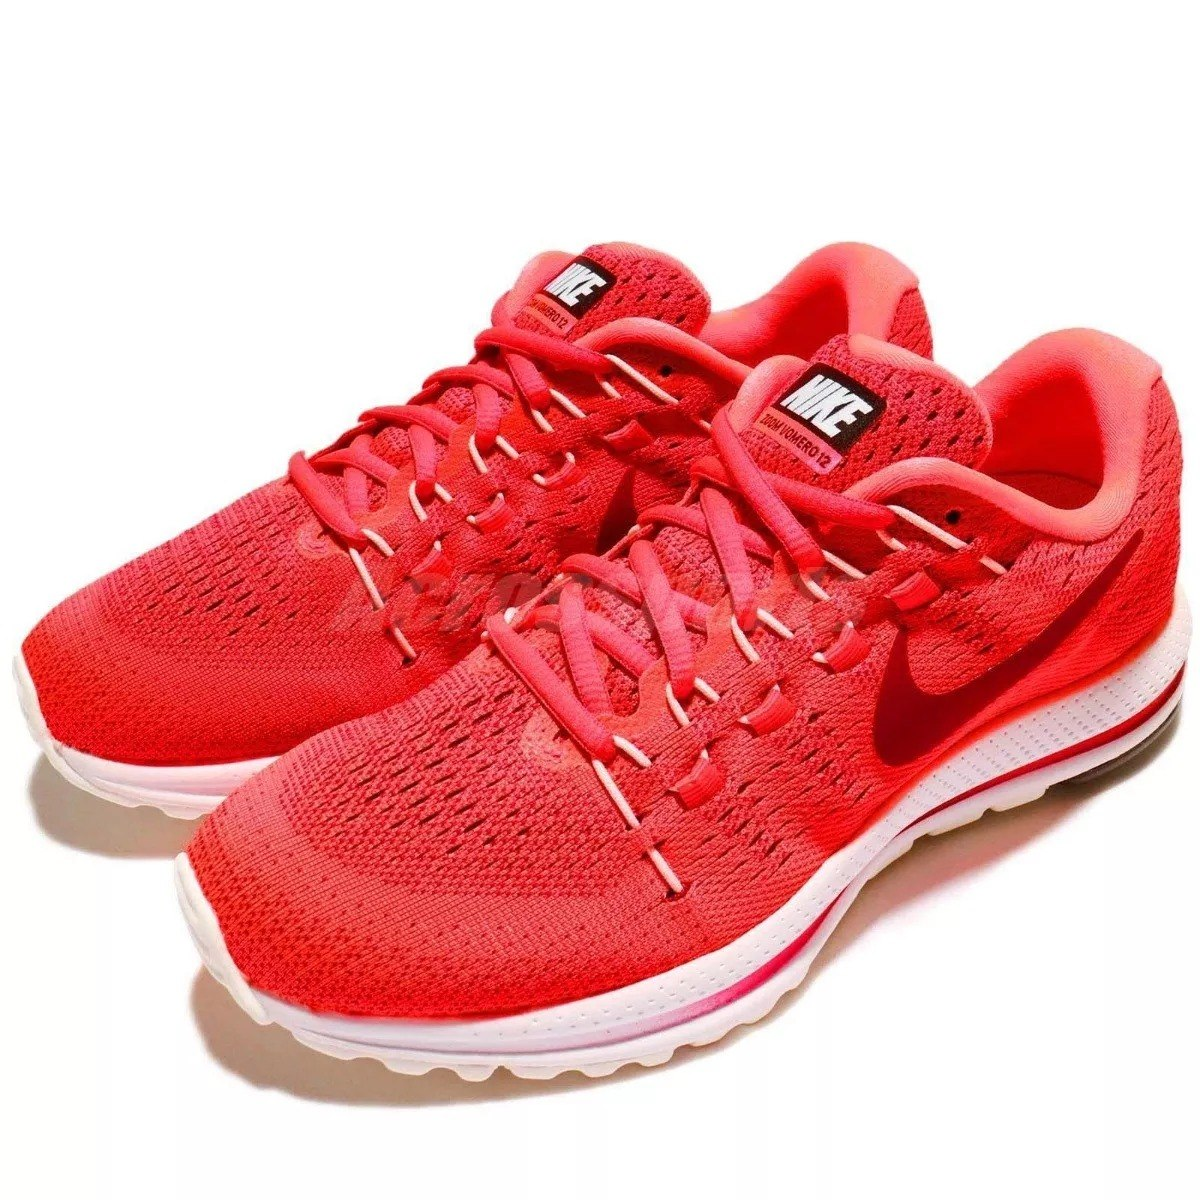 a4e74f38656cb 799 Zapatillas Nike 00 12mujersale Vomero Zoom 2 Wmns En Air BvBS6q ...